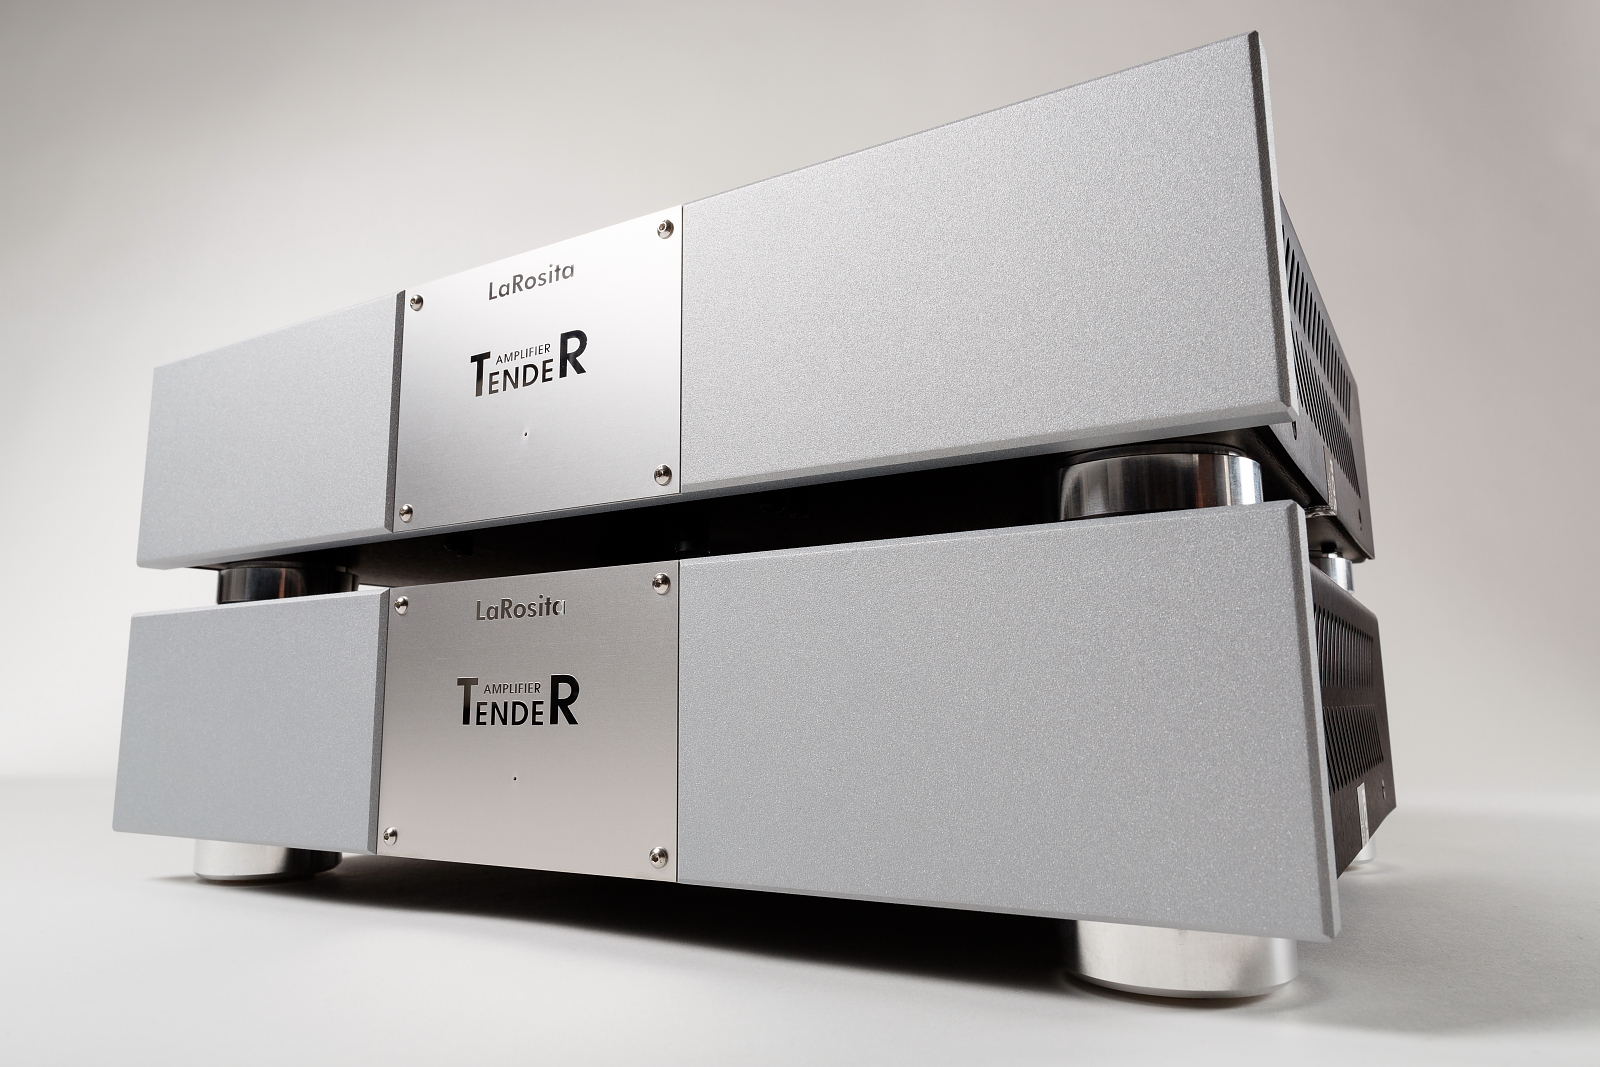 La Rosita Super Tender - 04 1600px